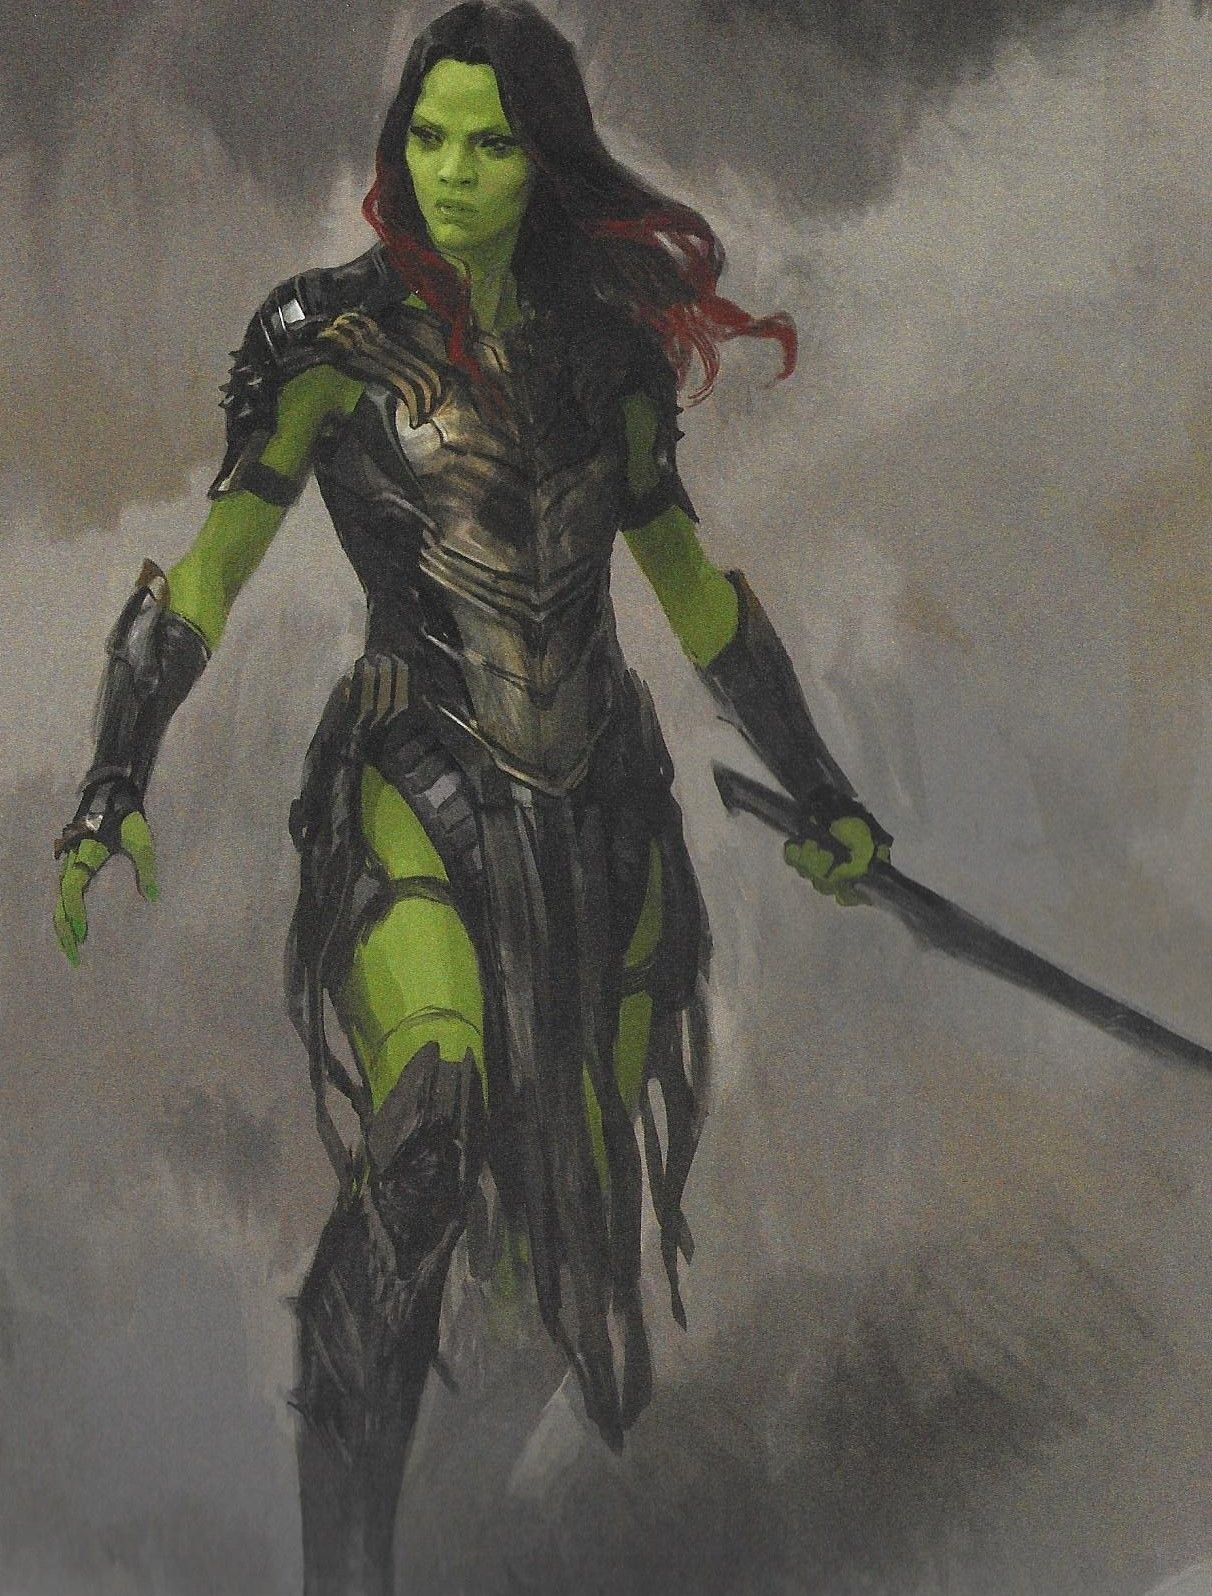 Thor Endgame Concept Art Endgame Concept Art In 2020 Marvel Characters Art Marvel Concept Art Marvel Comics Art